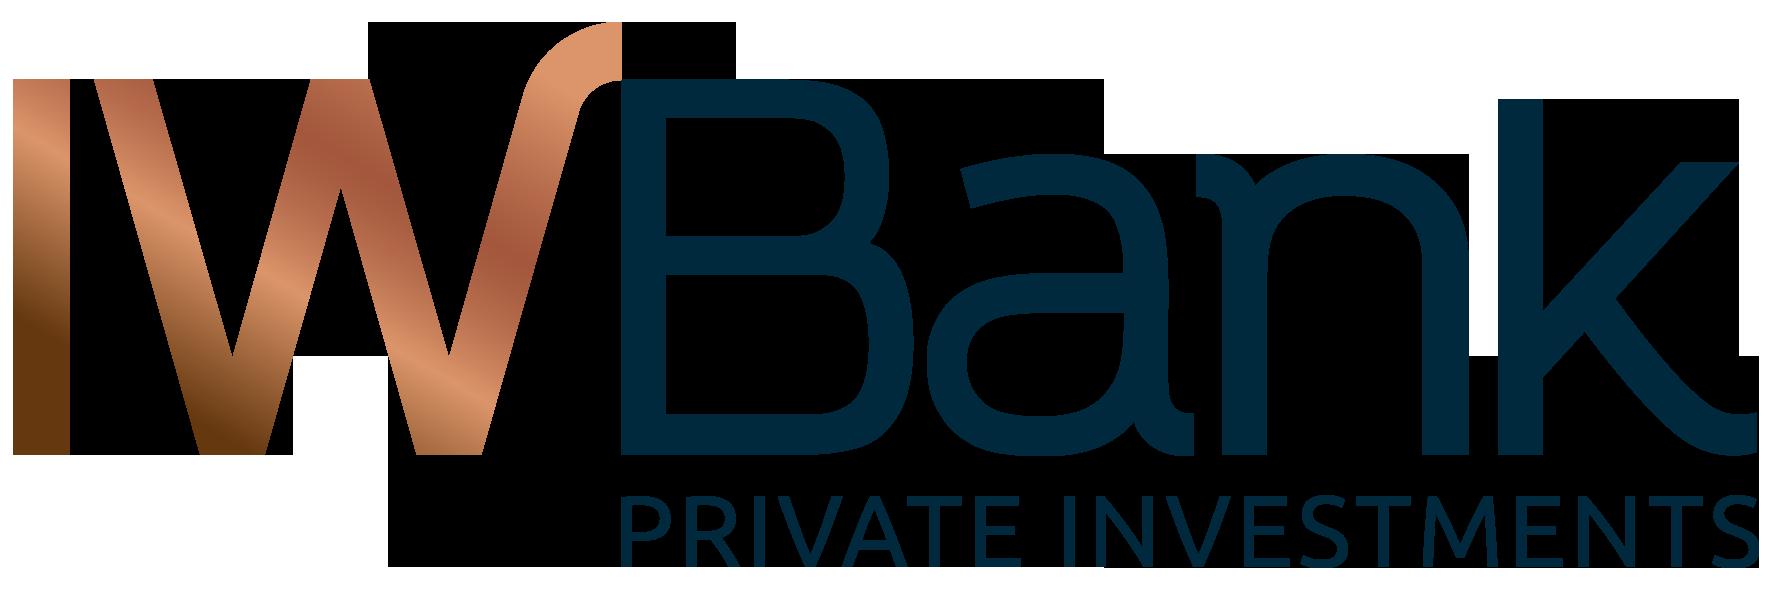 Recensione IWBank: Analisi Servizi | Offerte | Carte | Home Banking